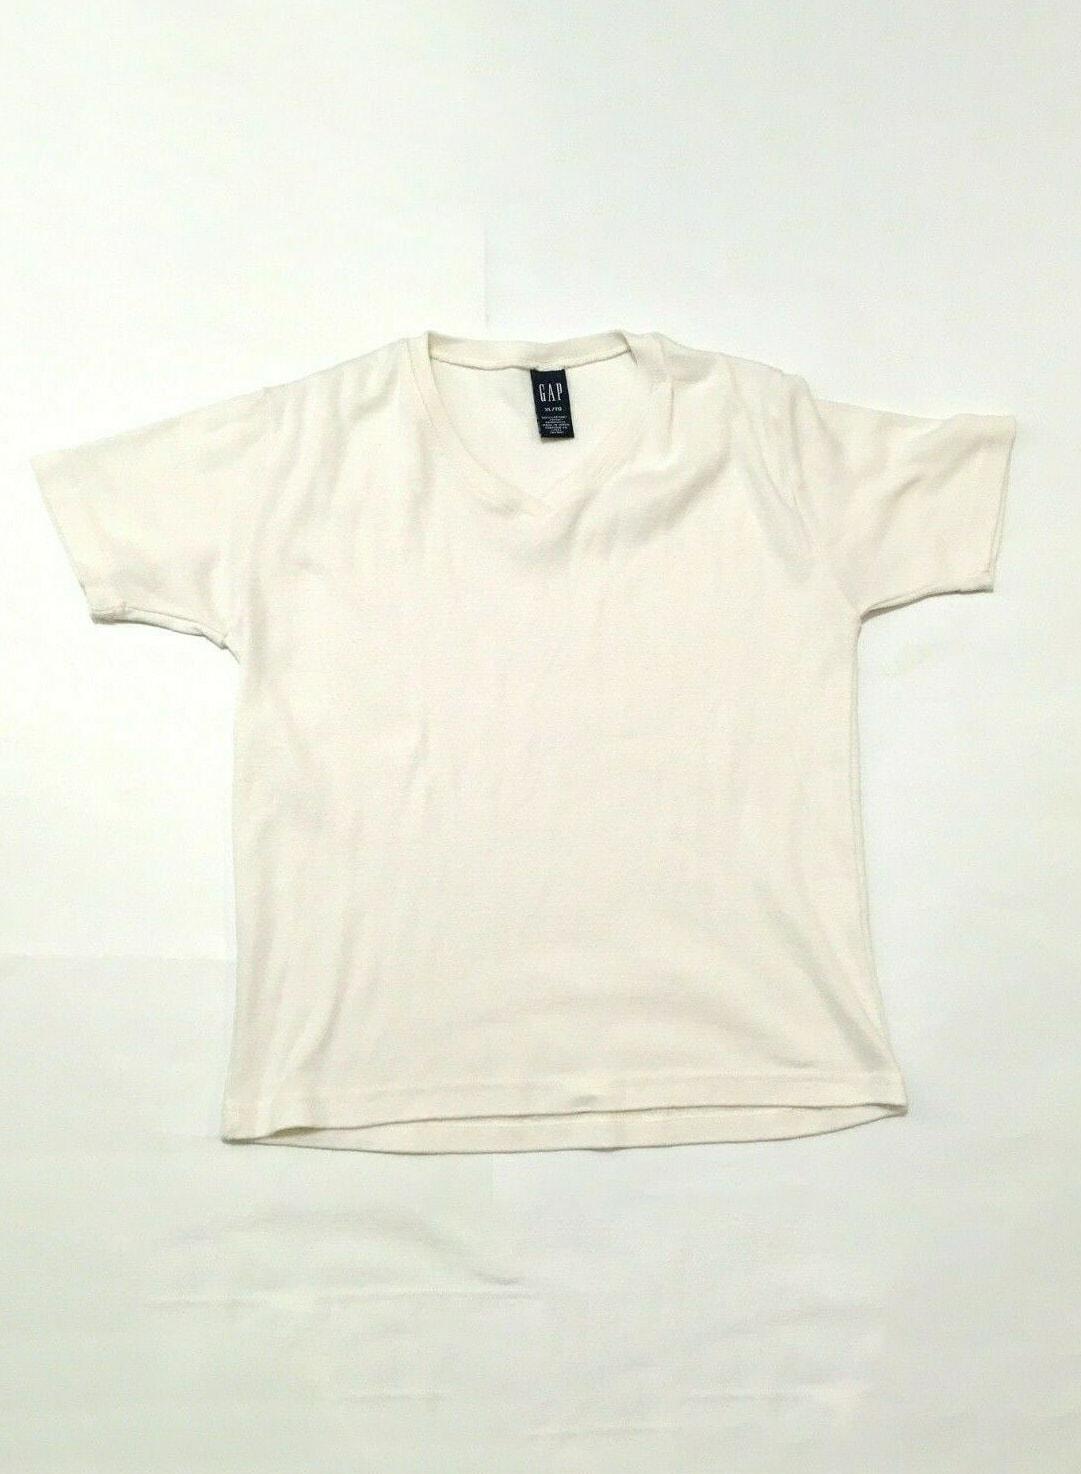 LOT (2) TWO The GAP Women Shirt XL White Grey V-Neck T-Shirts Vintage 1990s